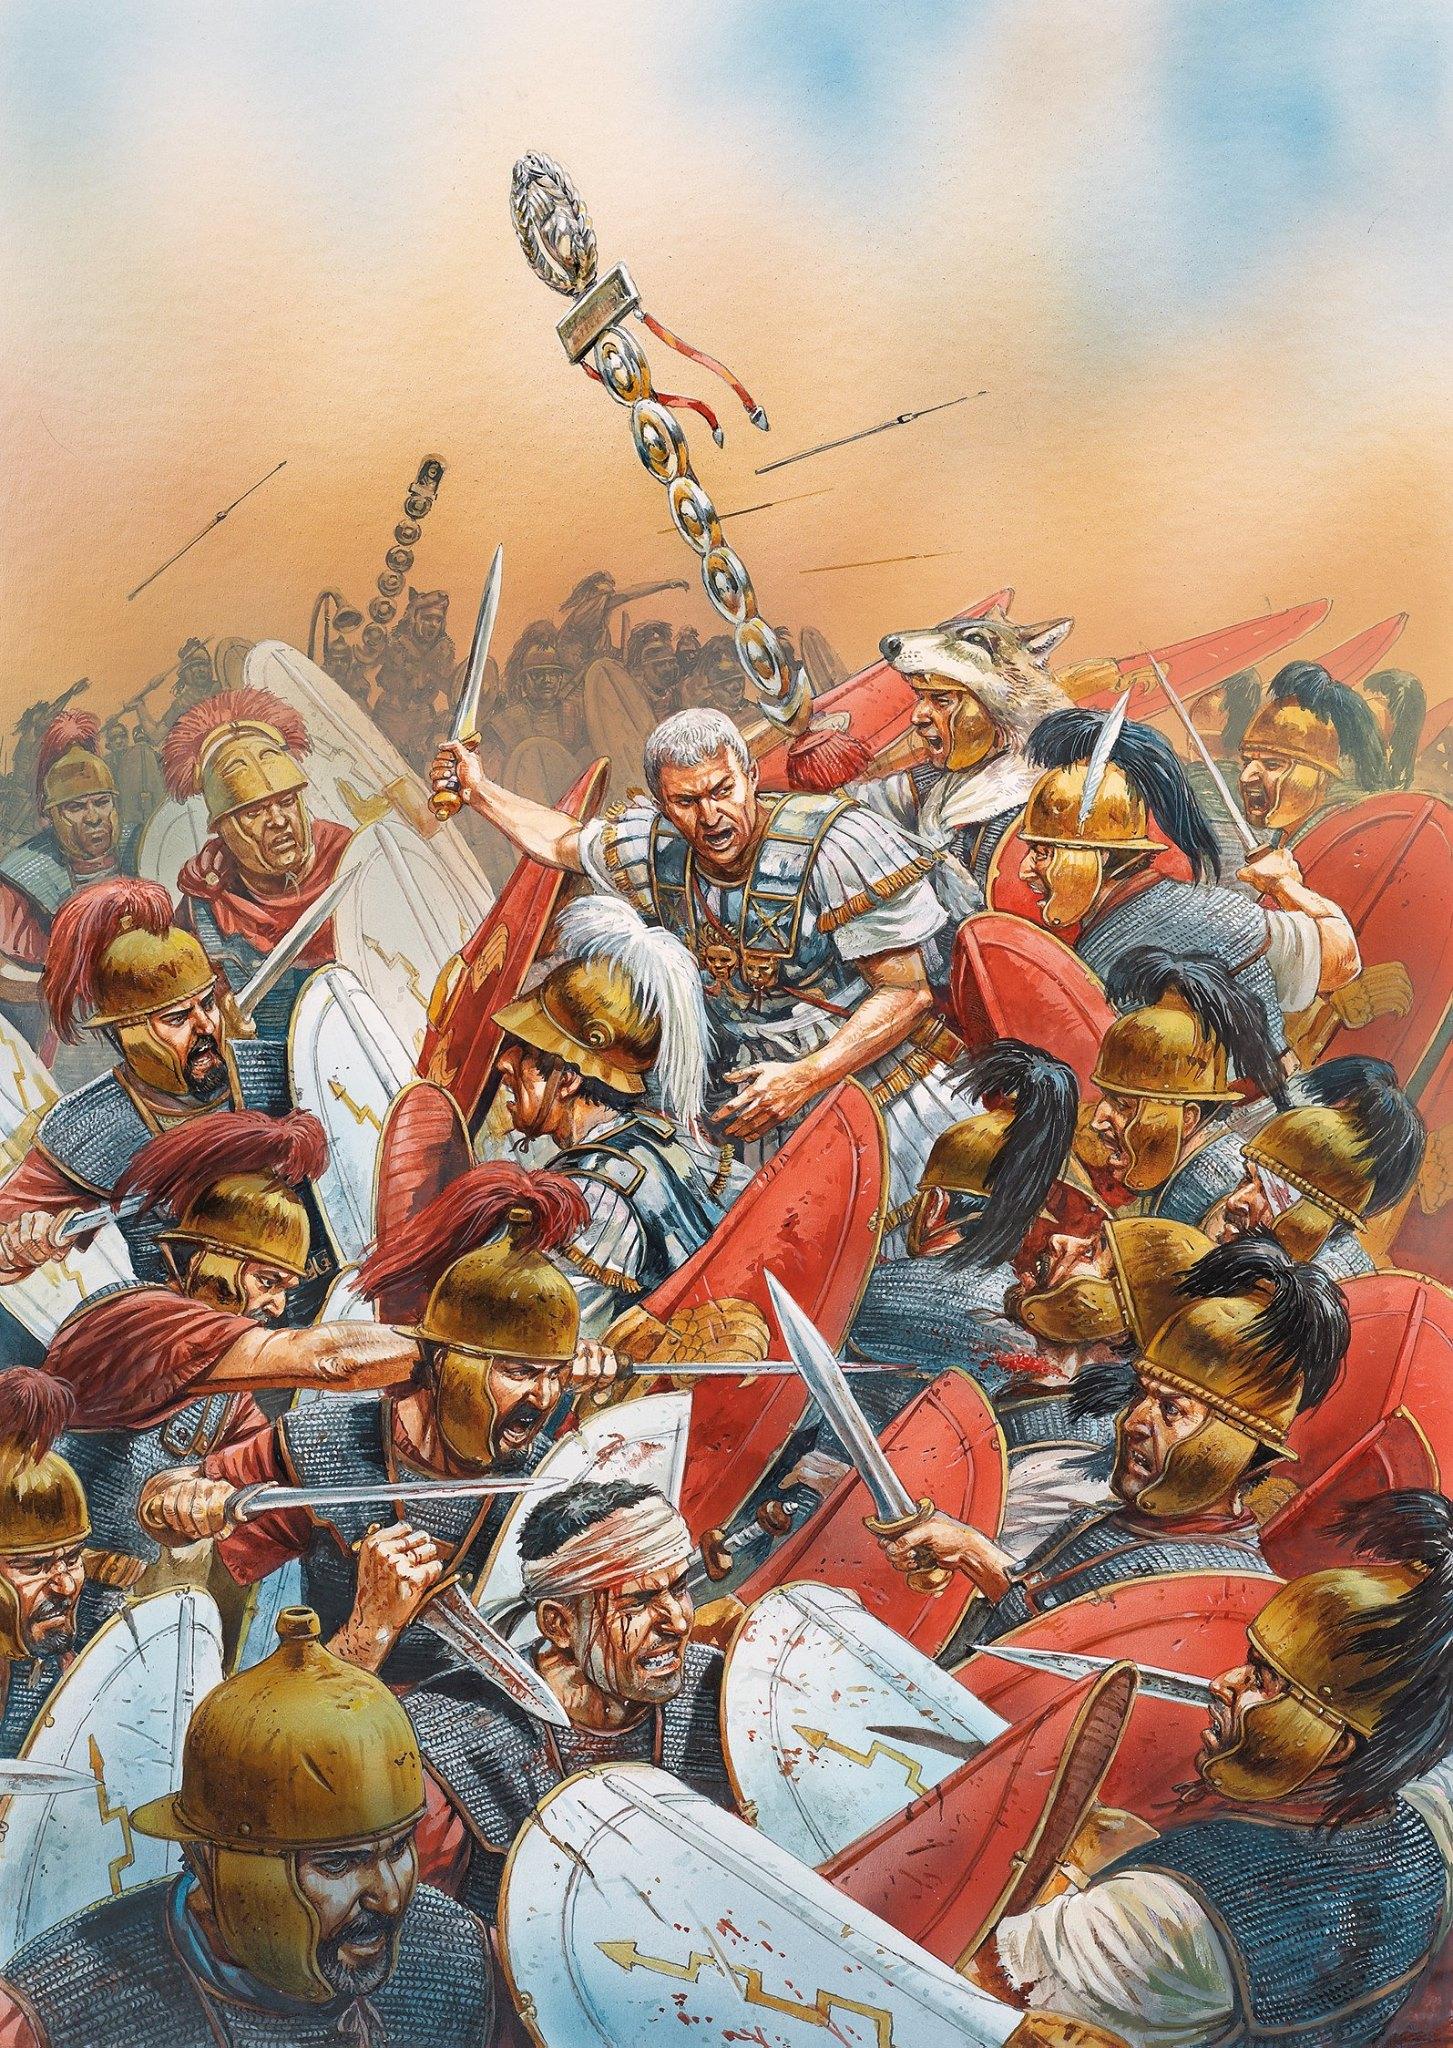 describing the leadership of augustus caesar in the ancient roman empire